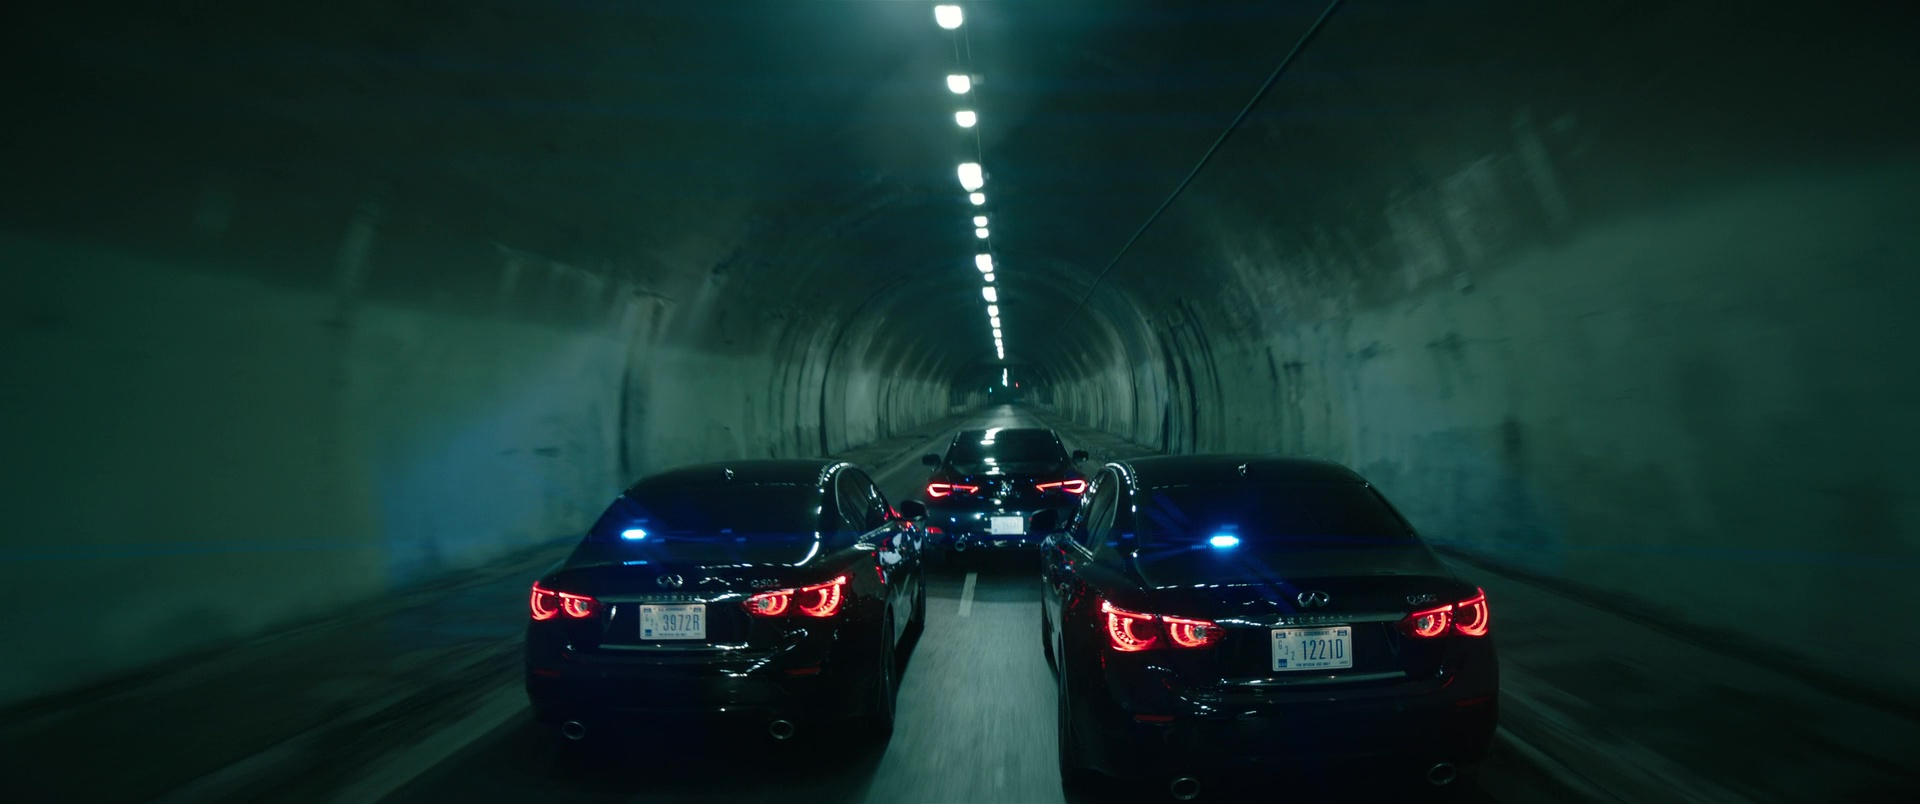 Infiniti Q50s And Q60 Cars In Bright 2017 Movie Scenes